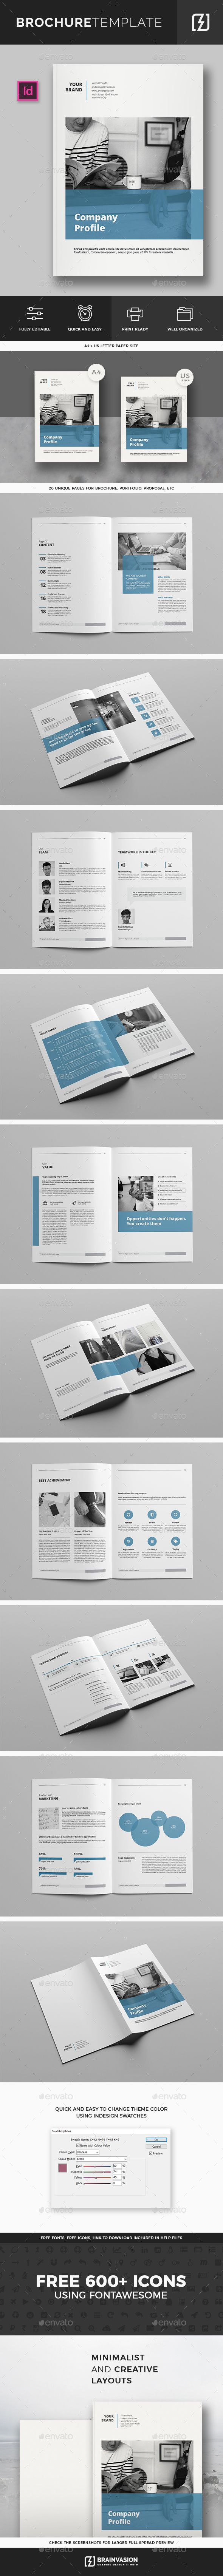 Company Profile Brochure Template 760 best 2